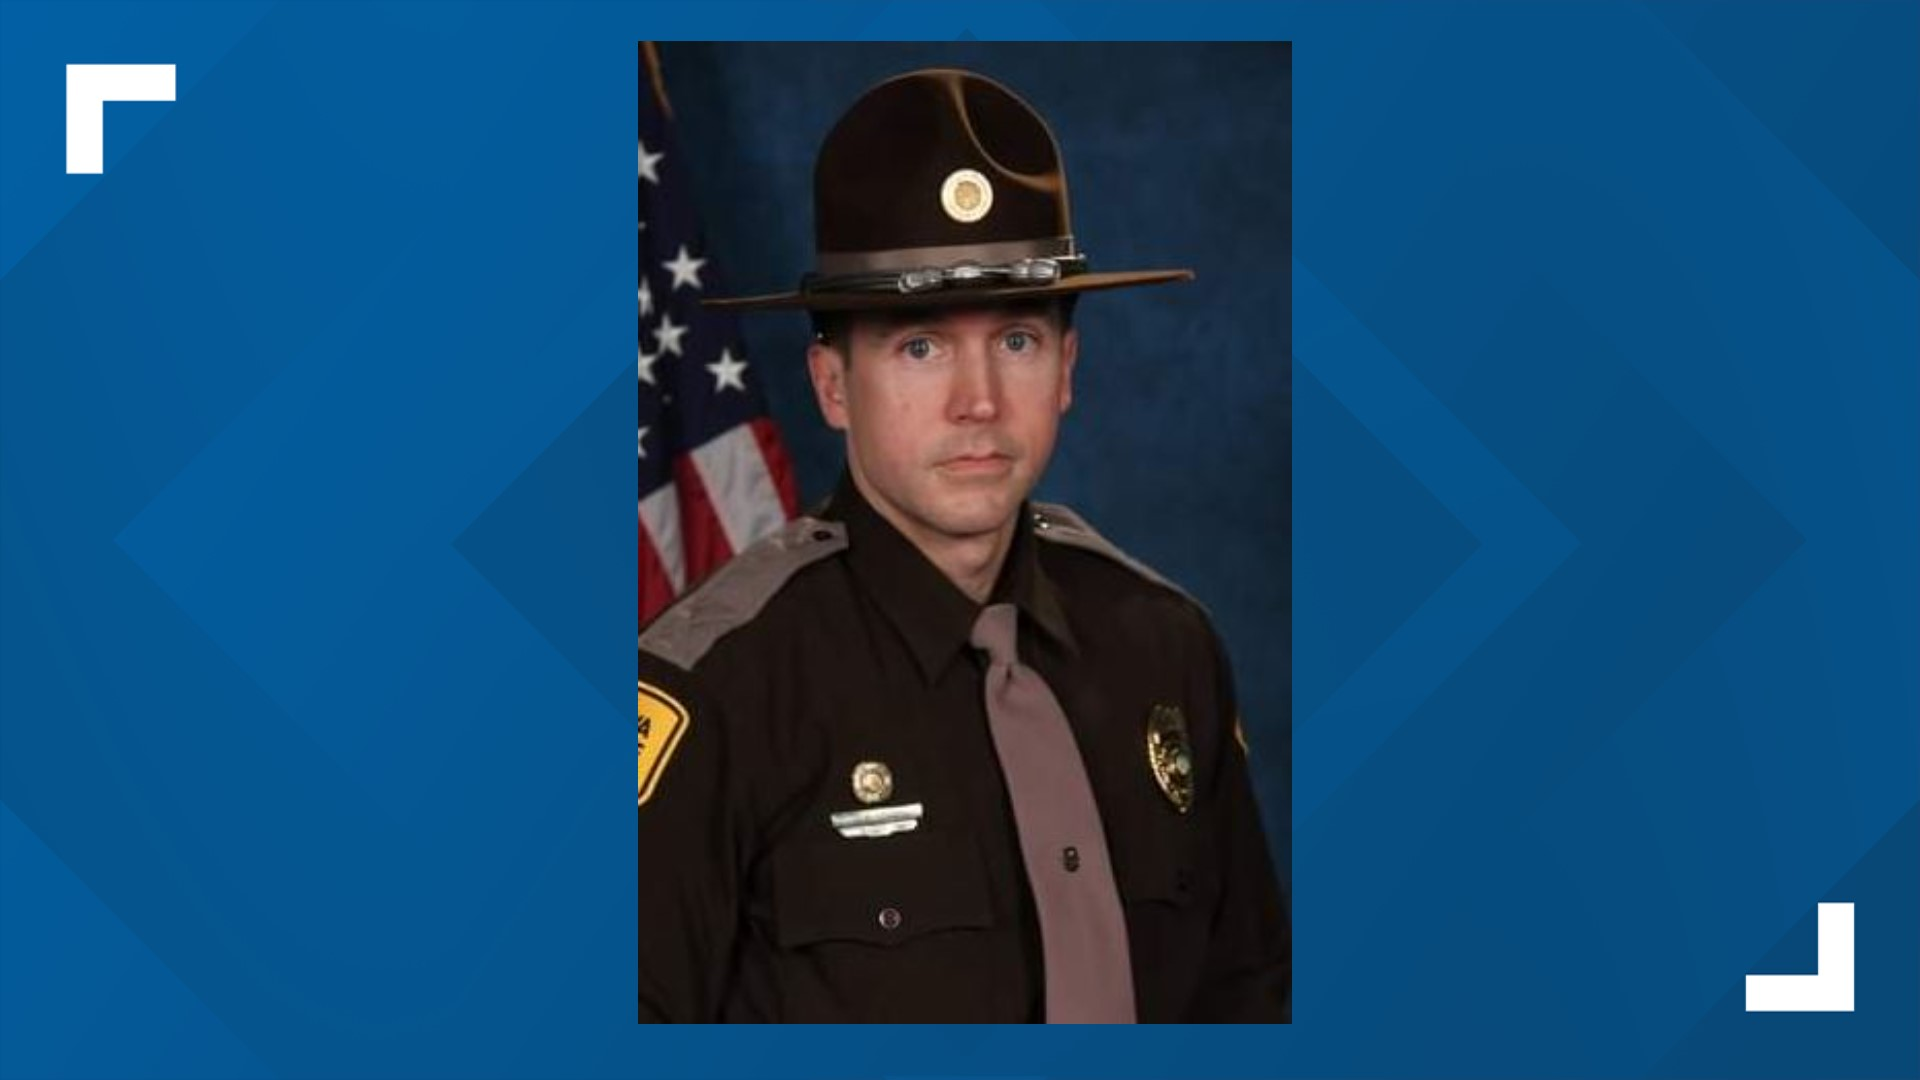 Iowa State Patrol Jim Smith Wikipedia, Bio, Death Reason, Statements, Wife, Family, Salary